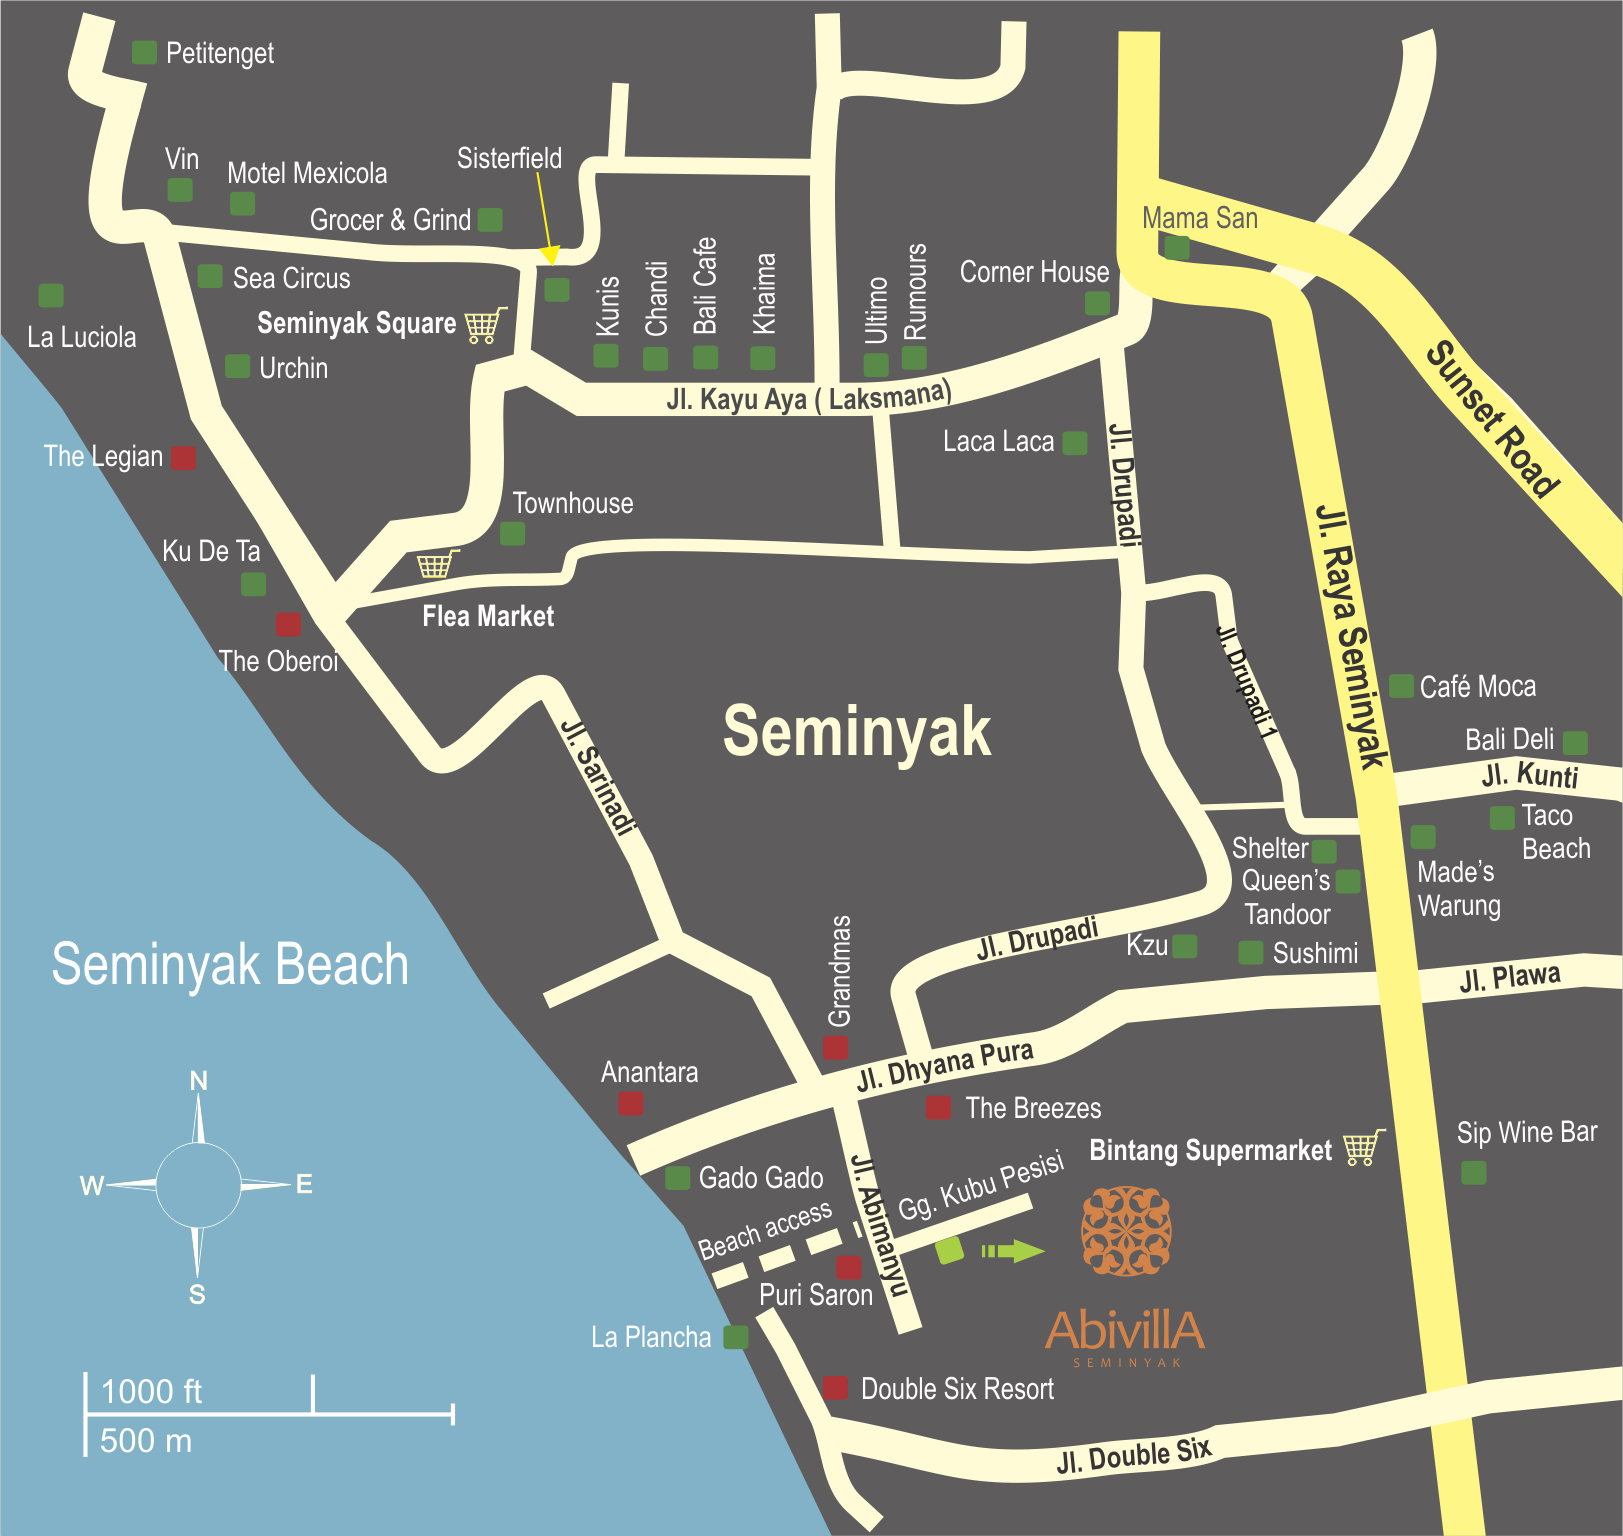 Abi Villa Map